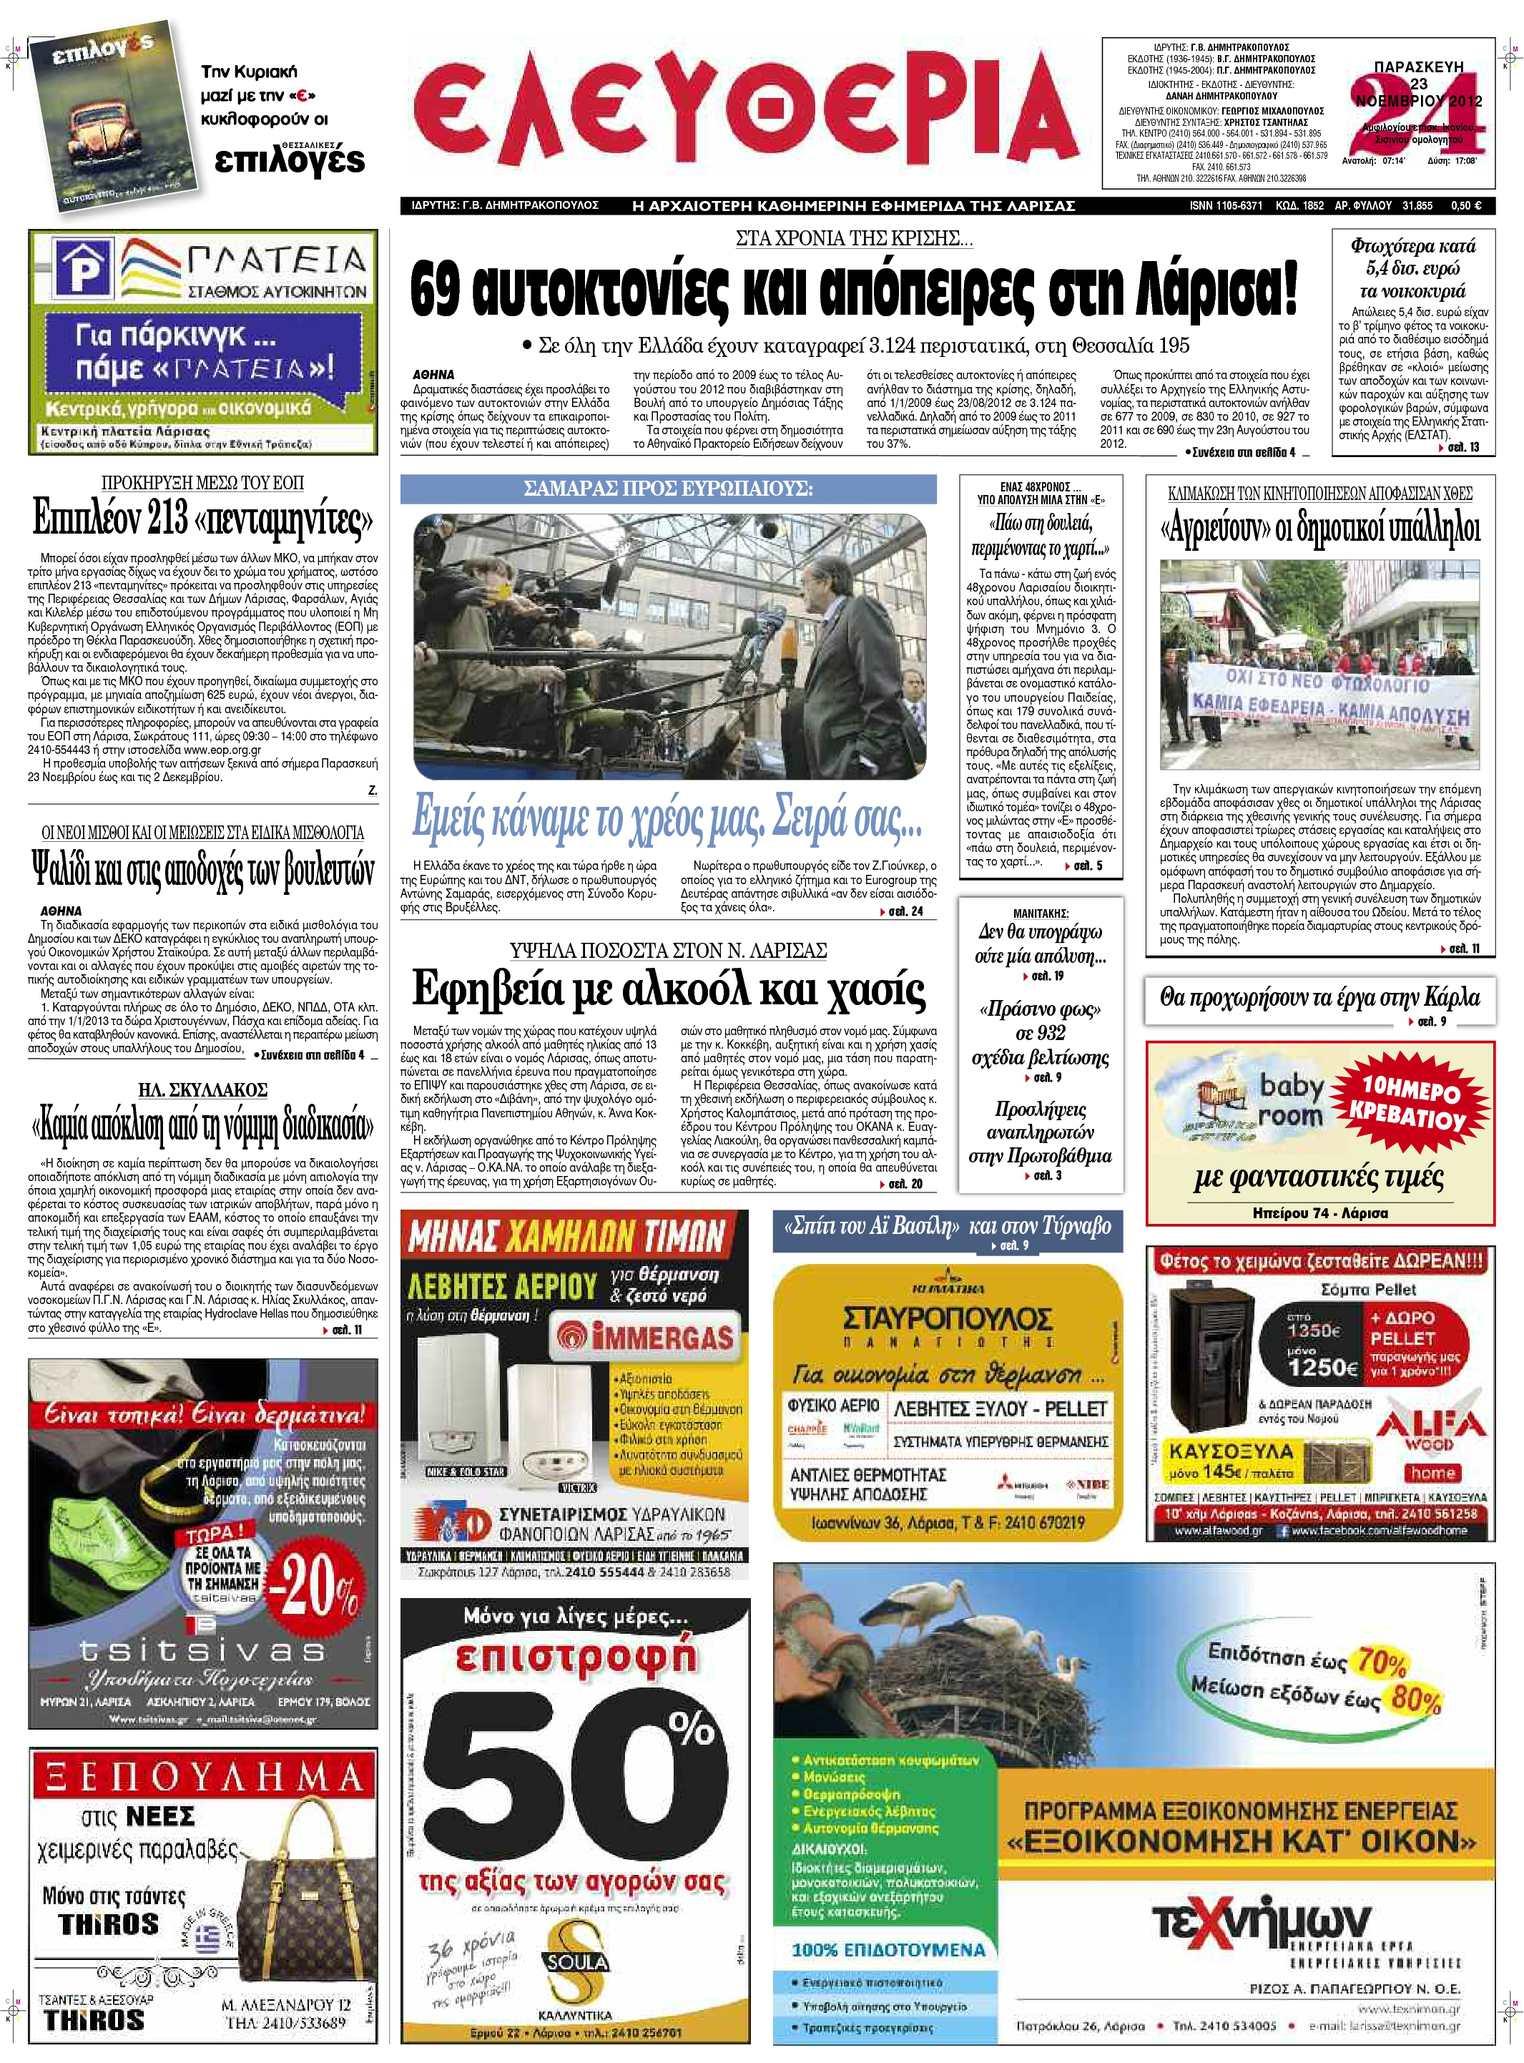 Calaméo - Eleftheria.gr 23 10 2012 48acfcdedd8